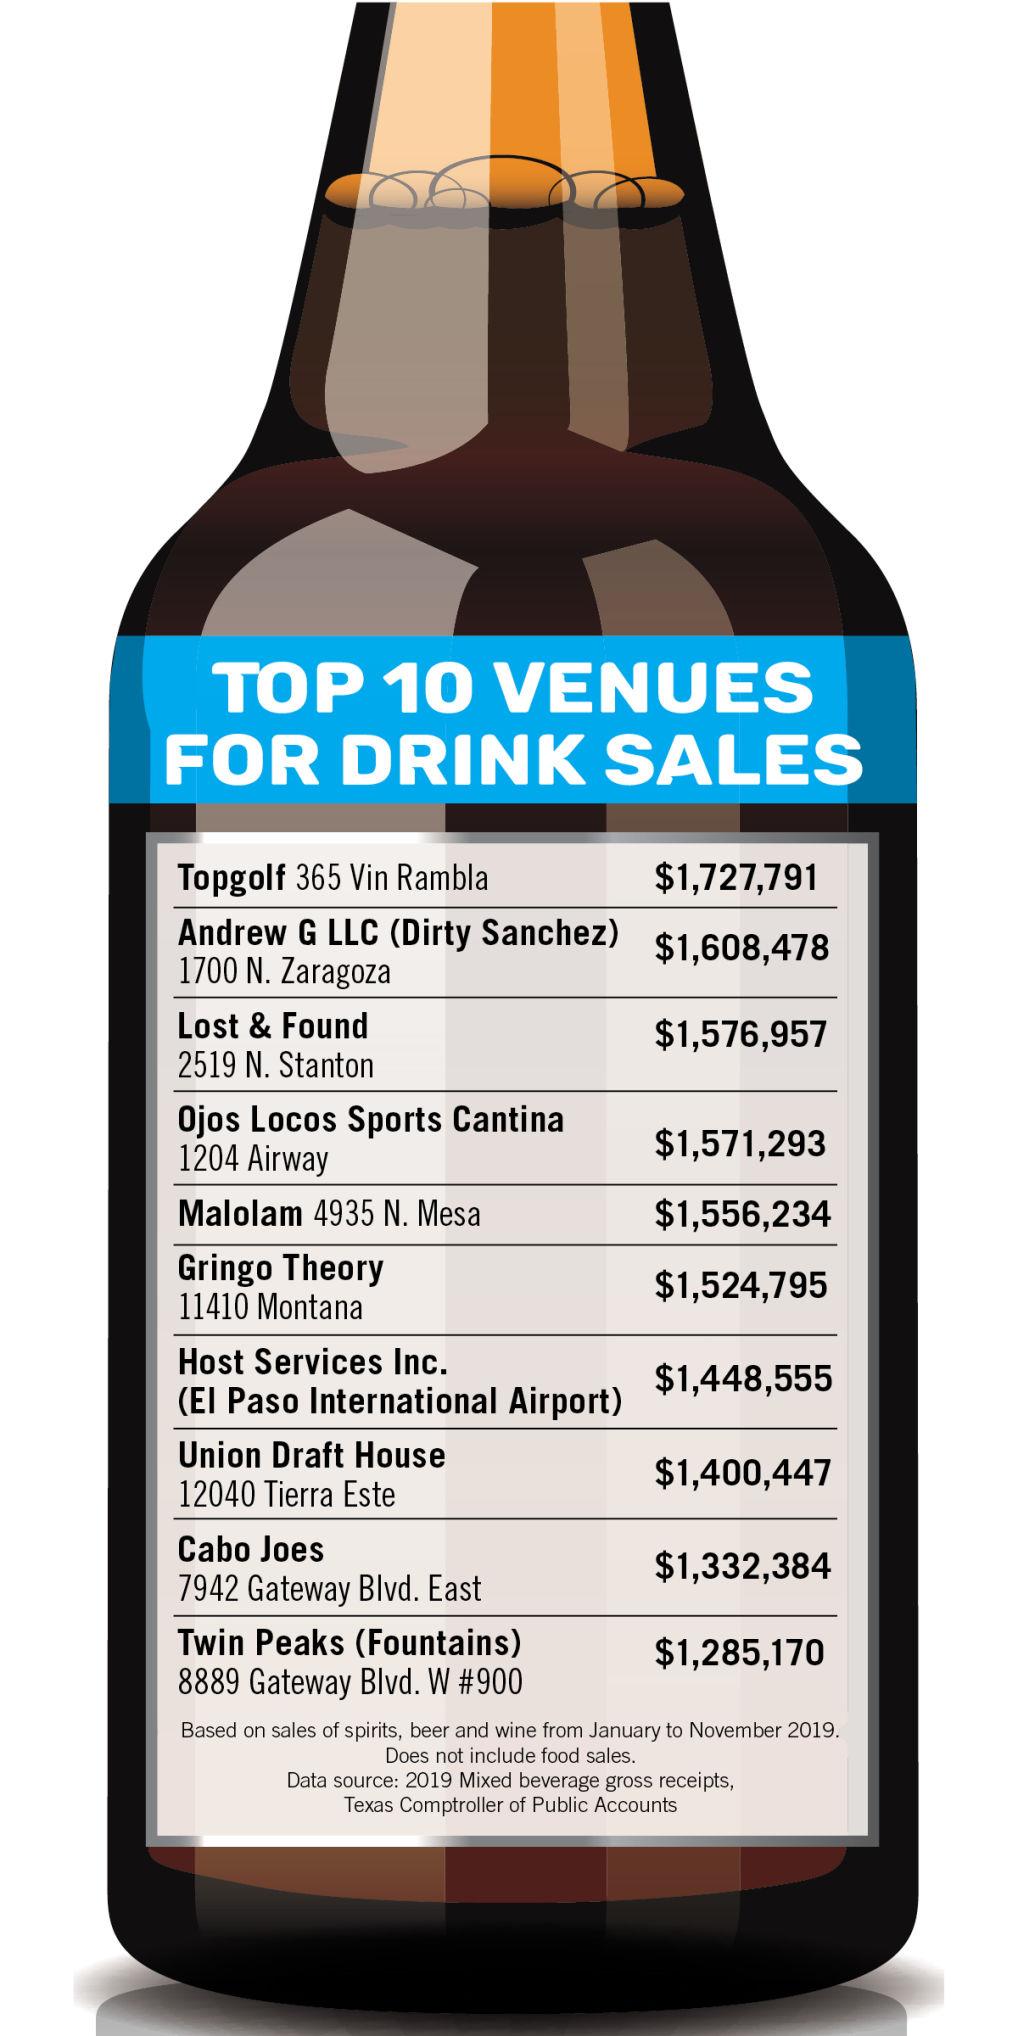 Top 10 venues for drink sales 2019